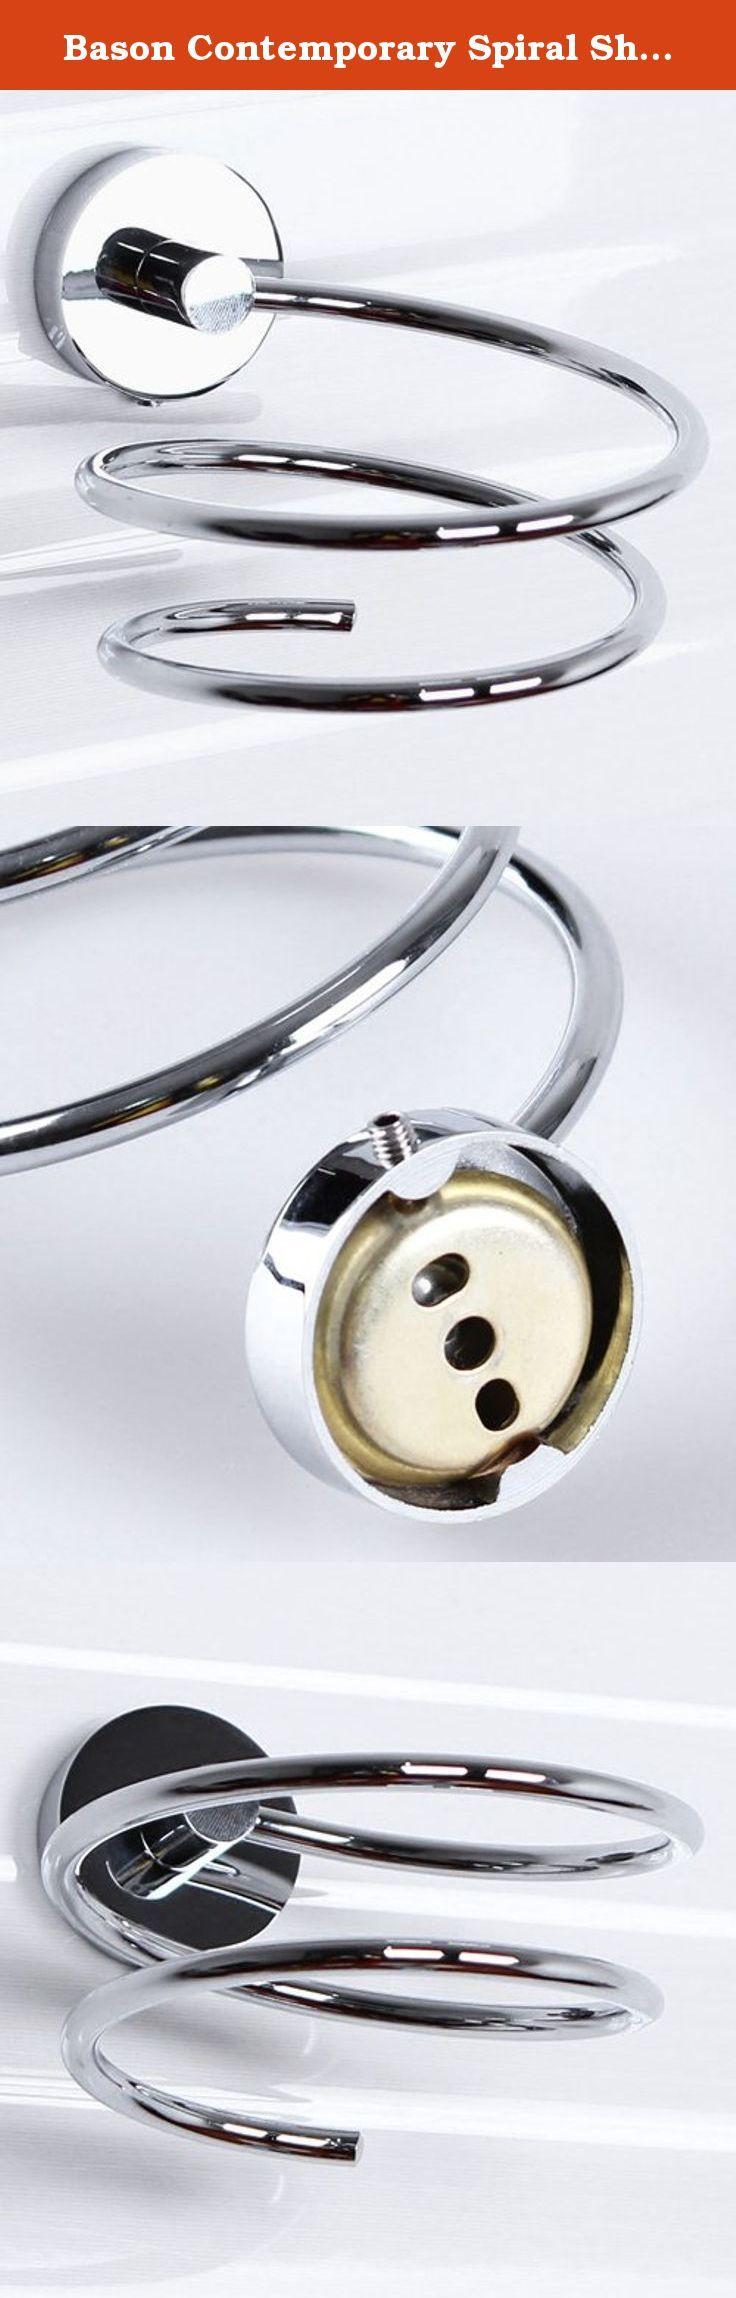 "Bason Contemporary Spiral Shape Durable Brass Material Hair Dryer Holder. Type: Bathroom Shelves Style: Contemporary Material: Brass Mount: Wall Mounted Shipping Weight: 0.29KG Dimension: #(100 x 75 mm (3.94 x 2.95 ""))."